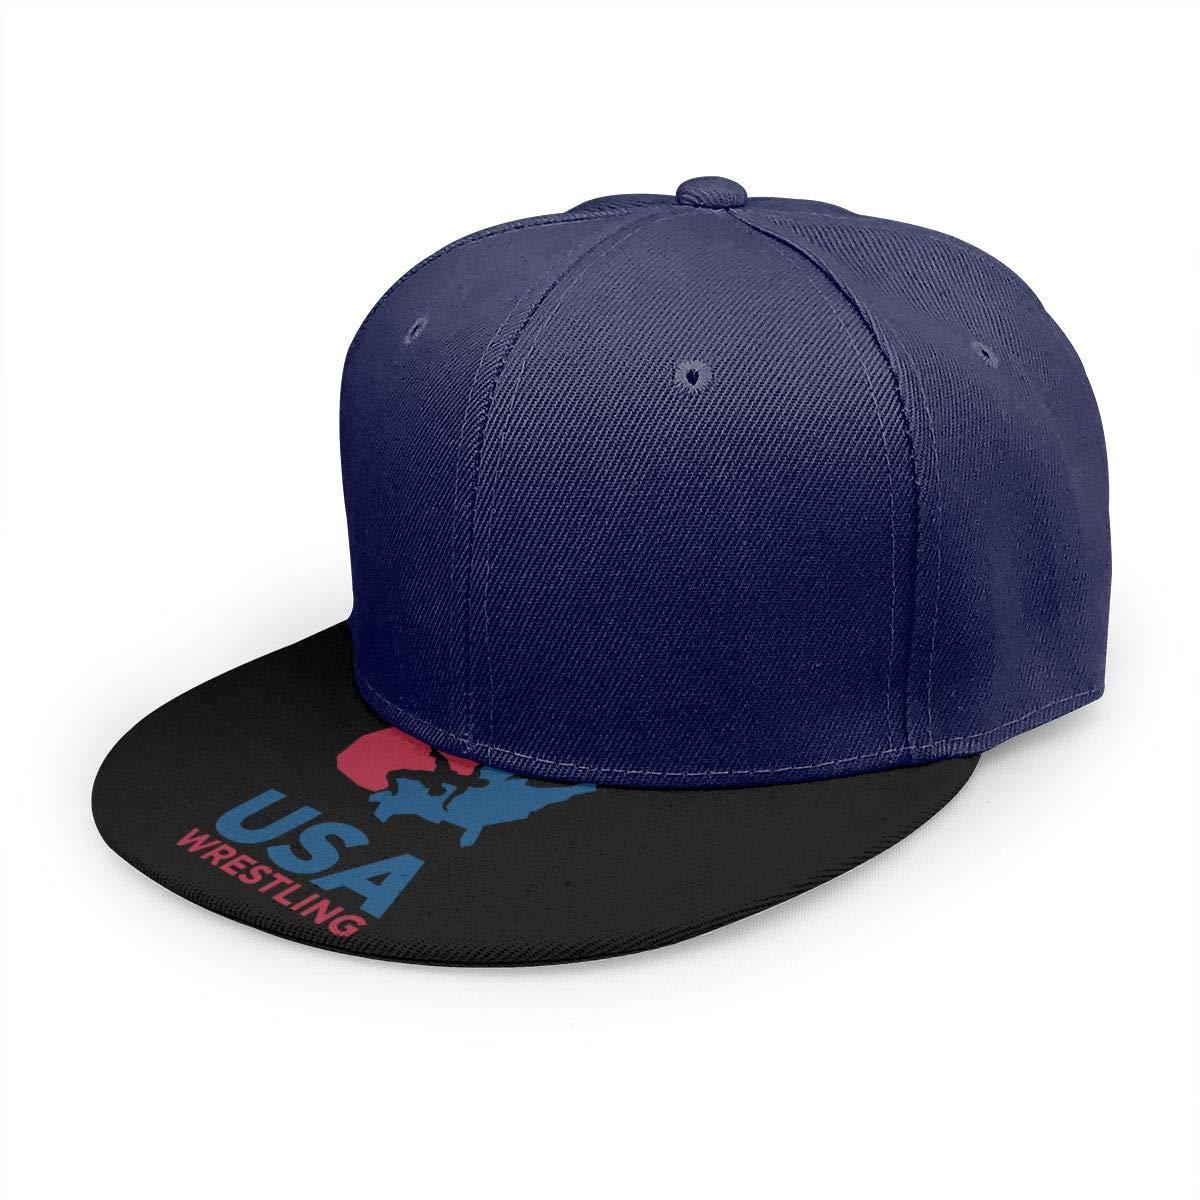 Adjustable Women Men USA Wrestling Logo Print Baseball Cap Flat Brim Cap Hats Hip Hop Snapback Sun Hat Boys Girls Navy by Apolonia